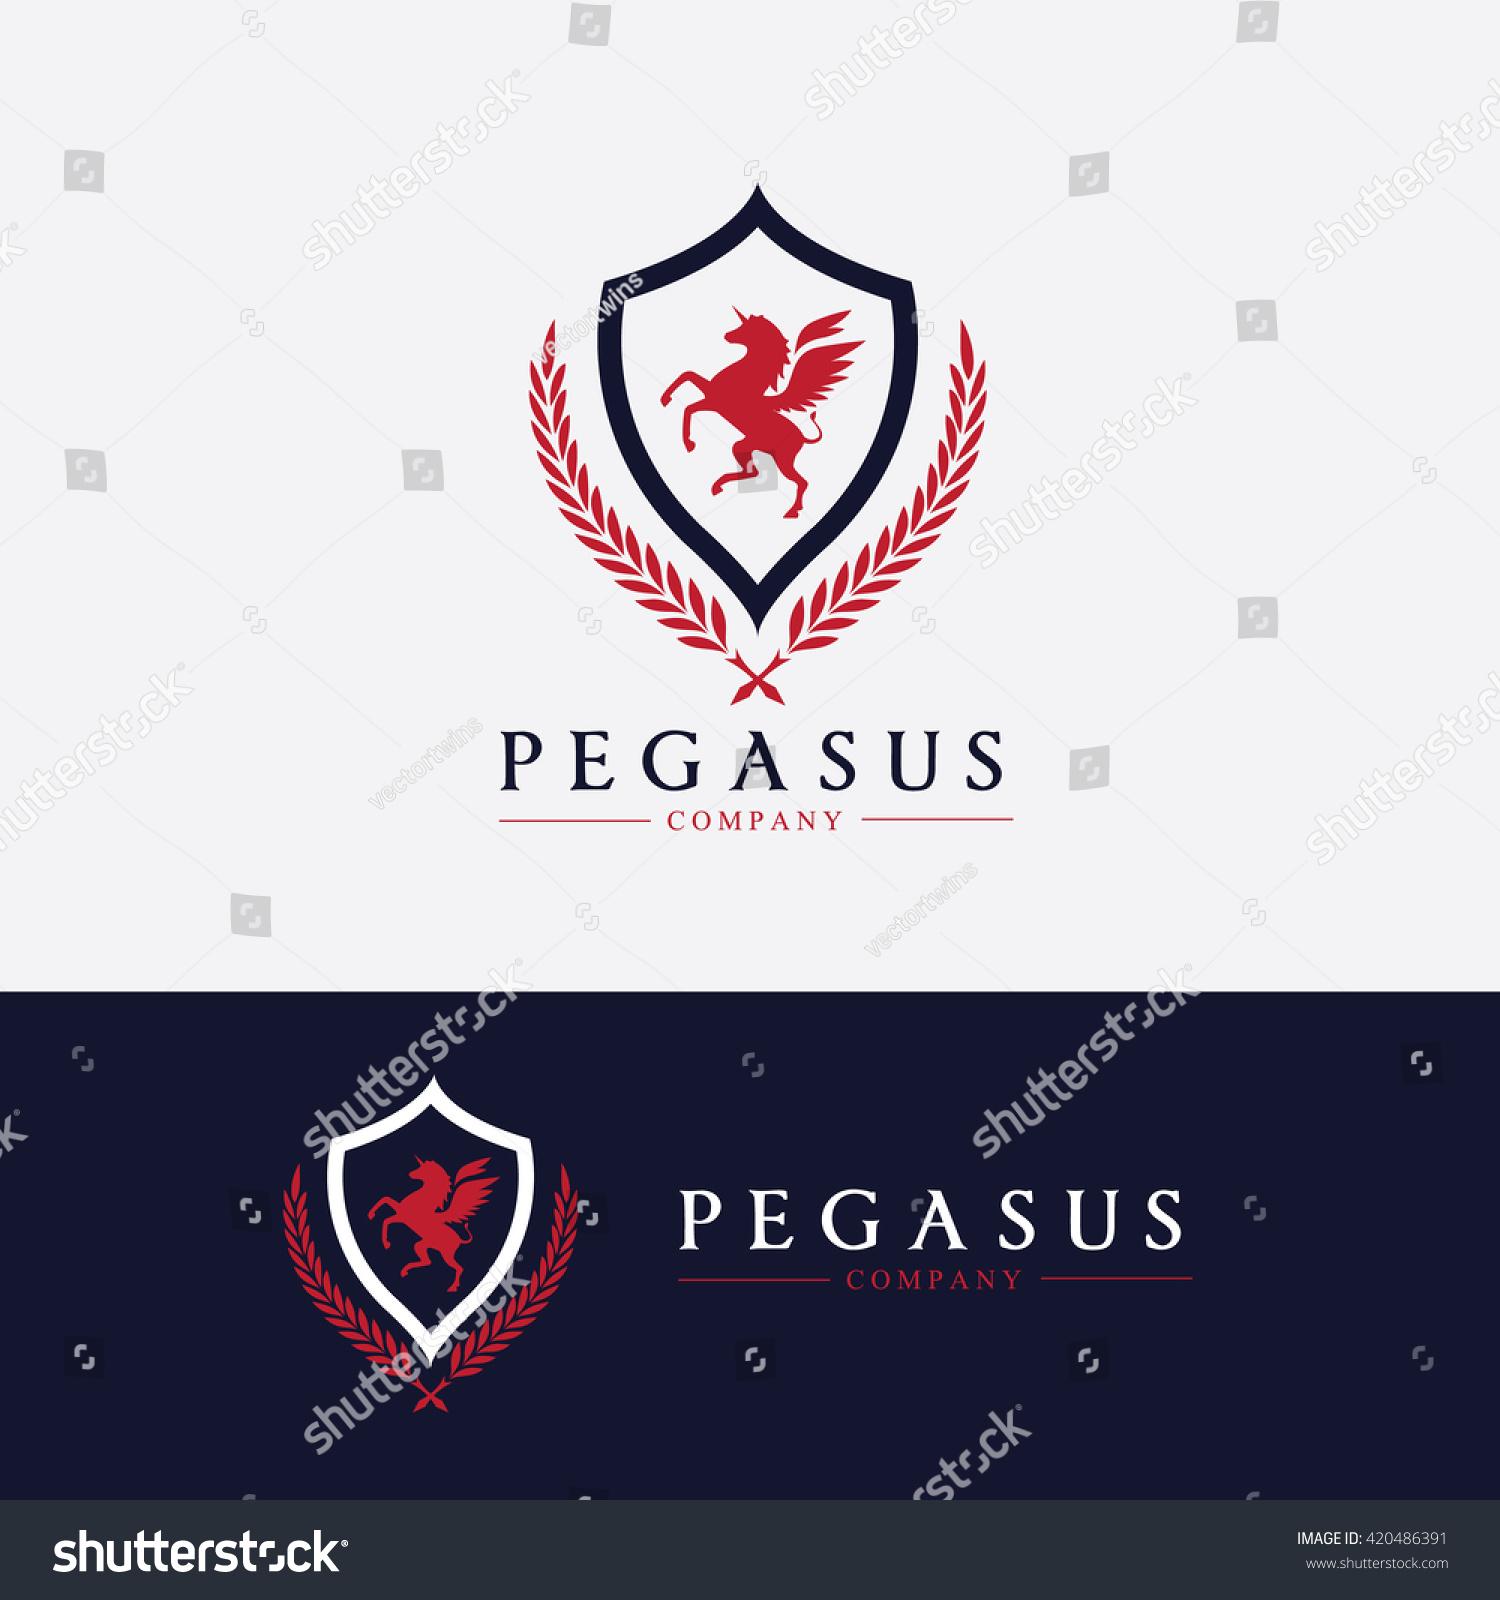 Pegasus Logoluxury Brand Logo Design Vector Stock Vector 420486391